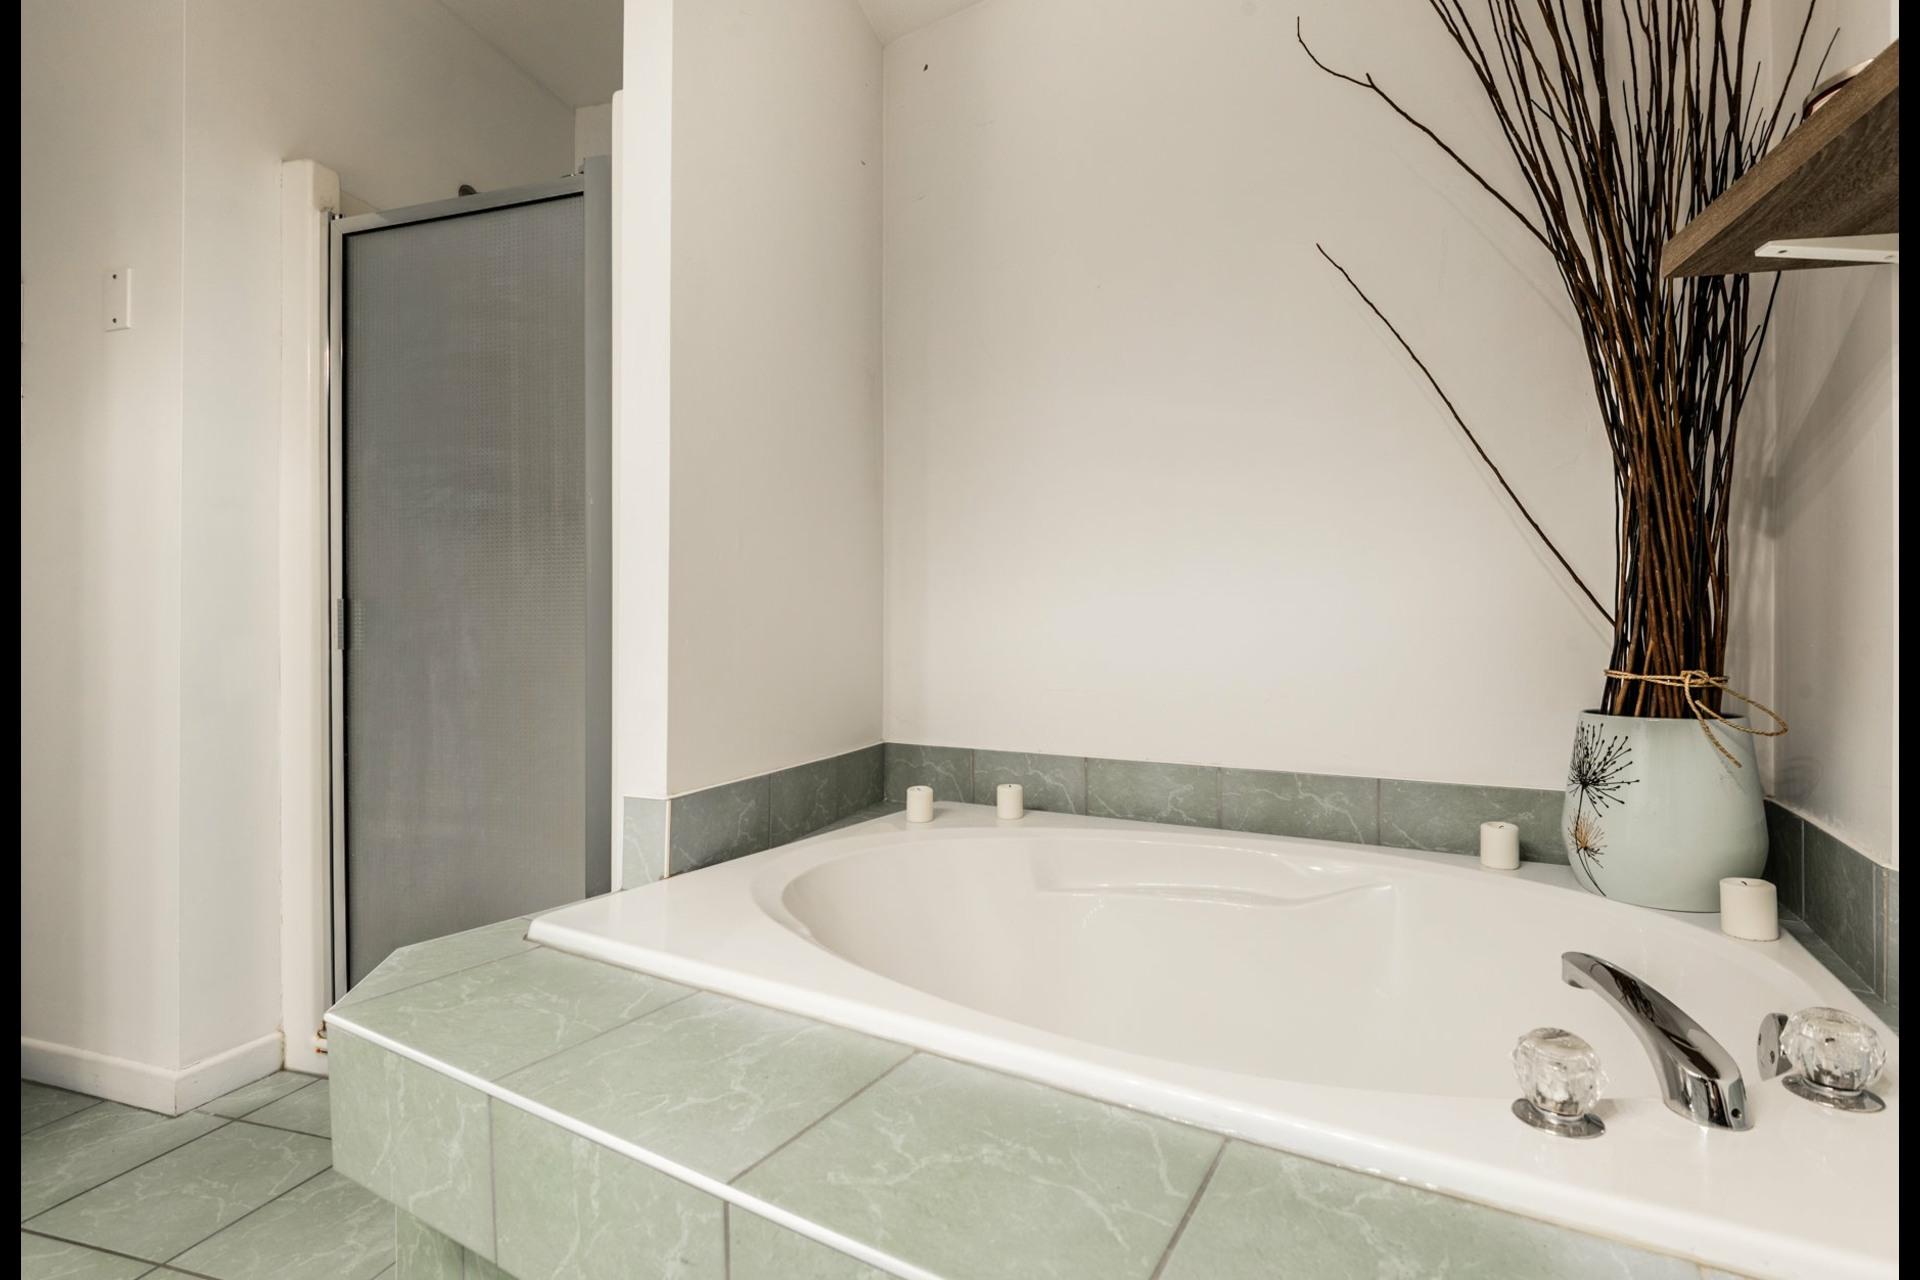 image 15 - Apartment For sale Saint-Hubert Longueuil  - 4 rooms